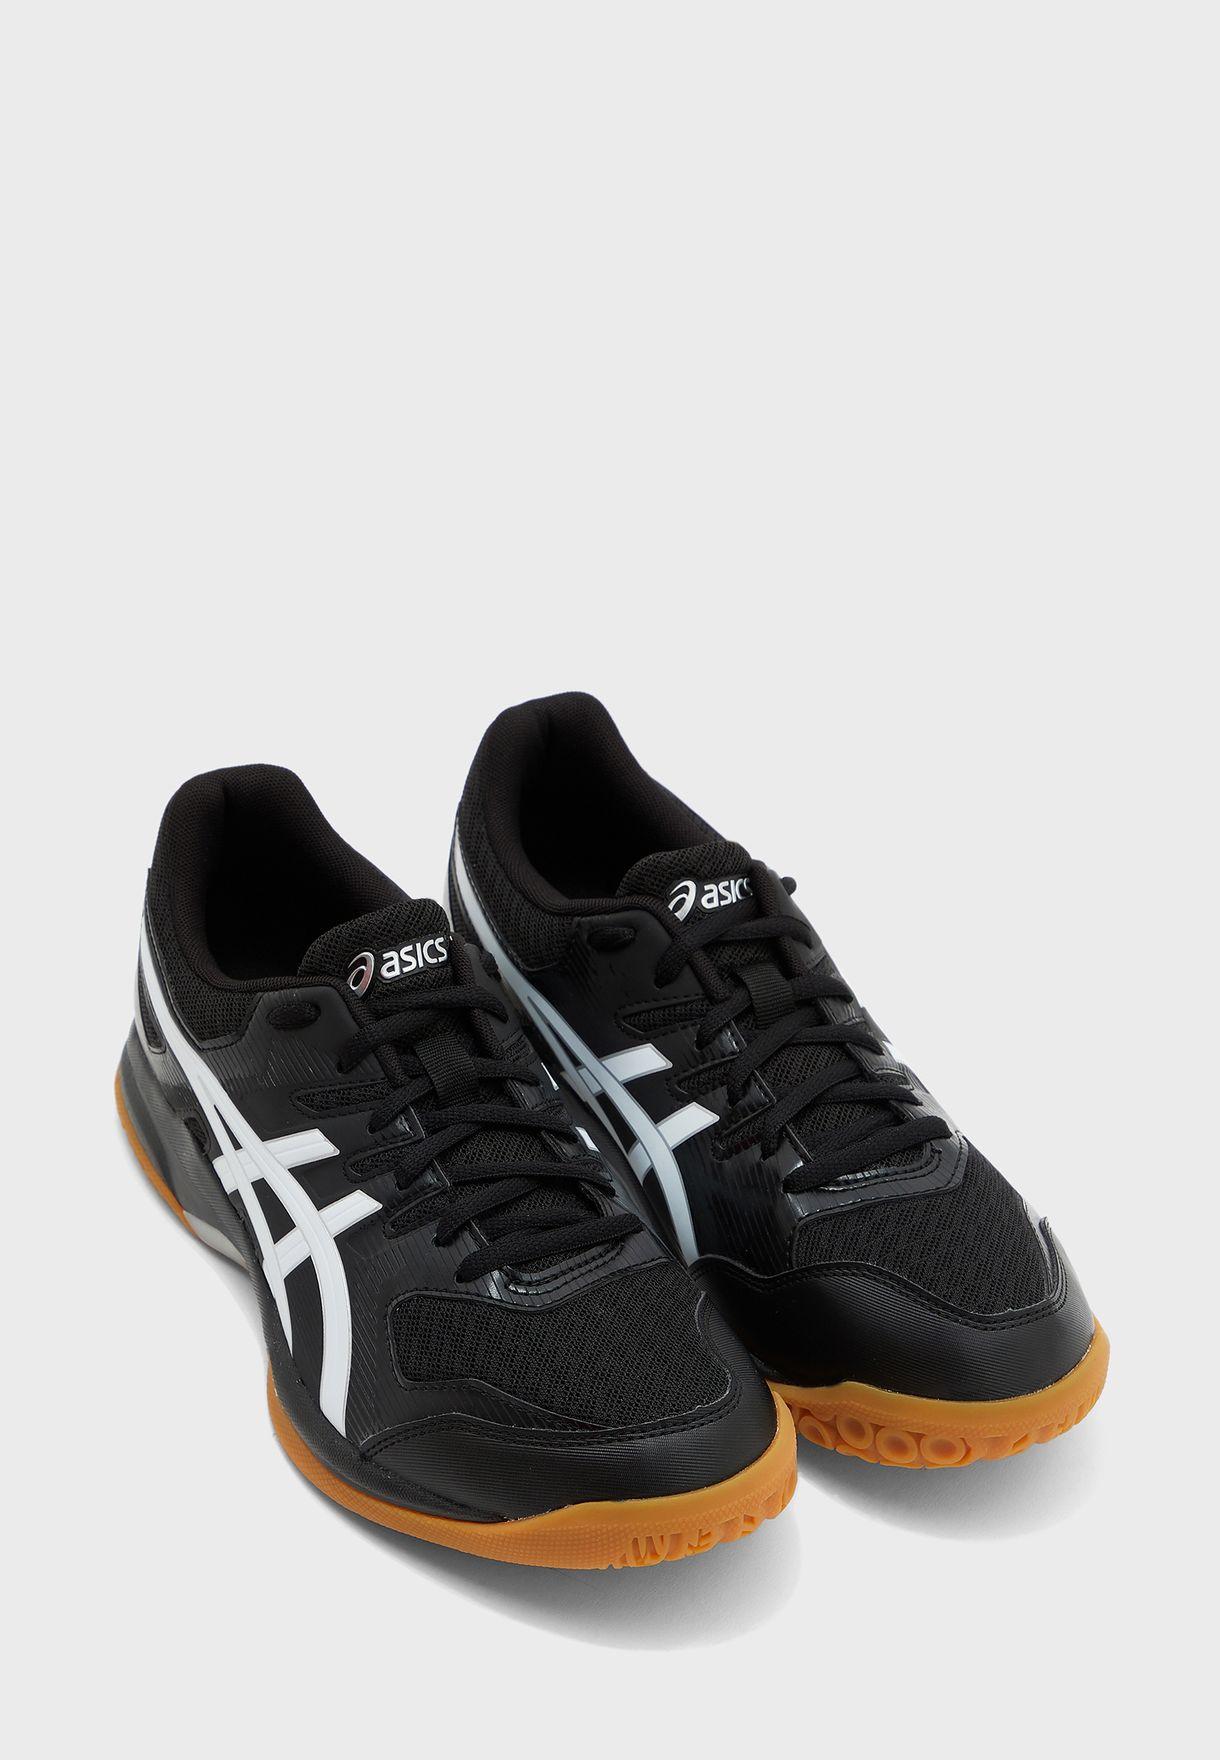 حذاء جيل - روكيت 9